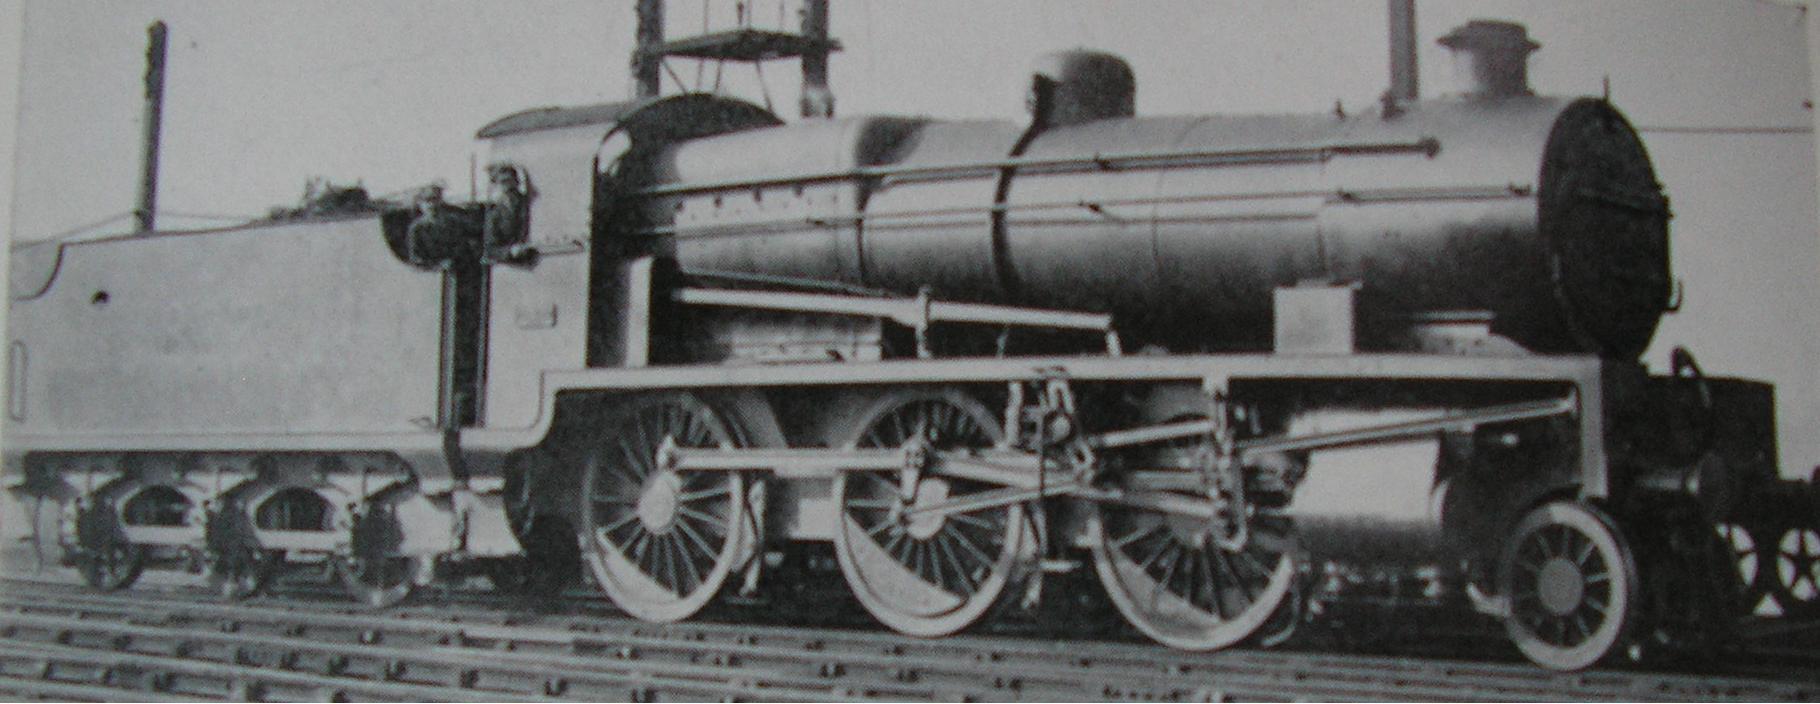 822 at Ashford Works in 1922. ©Public Domain